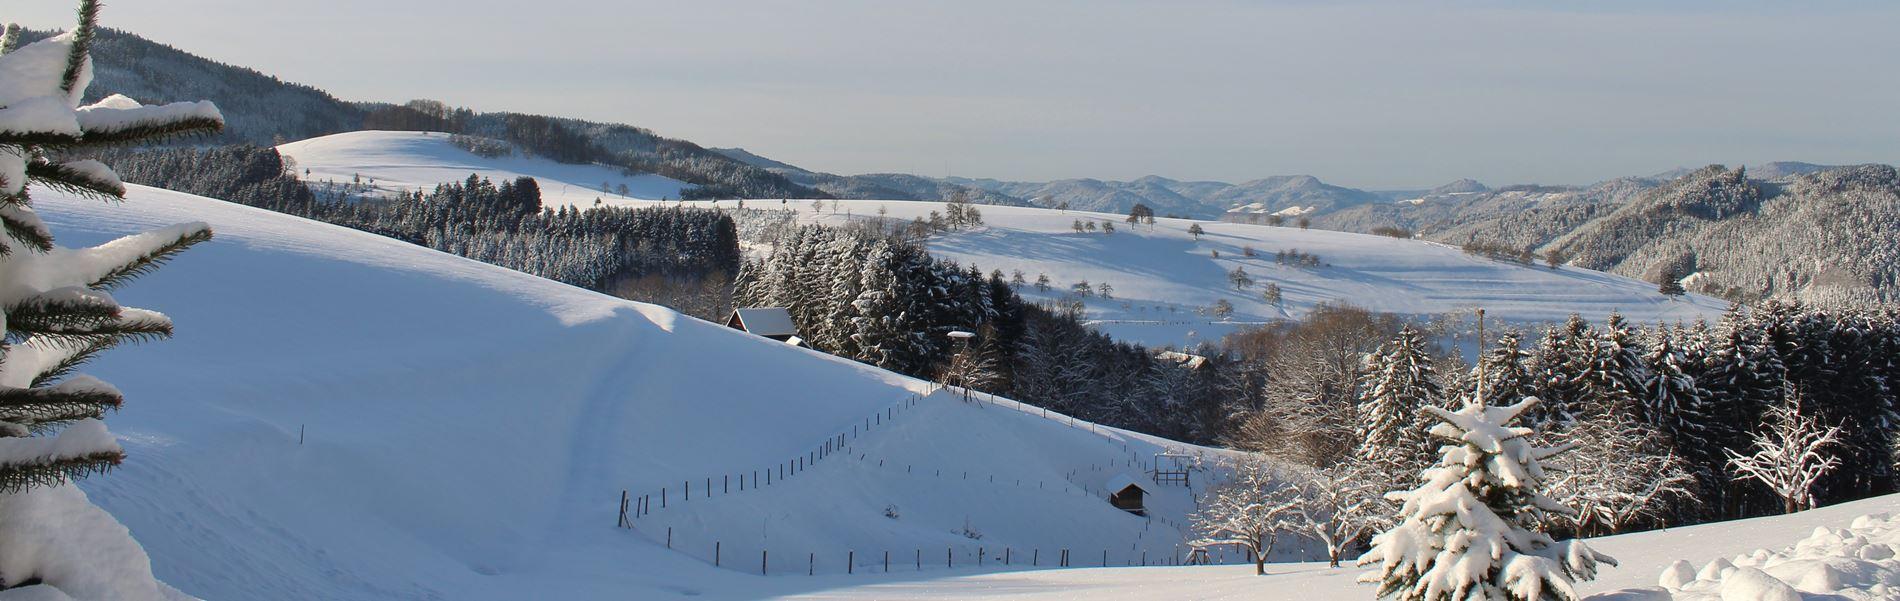 Winter in Oberharmersbach im Schwarzwald